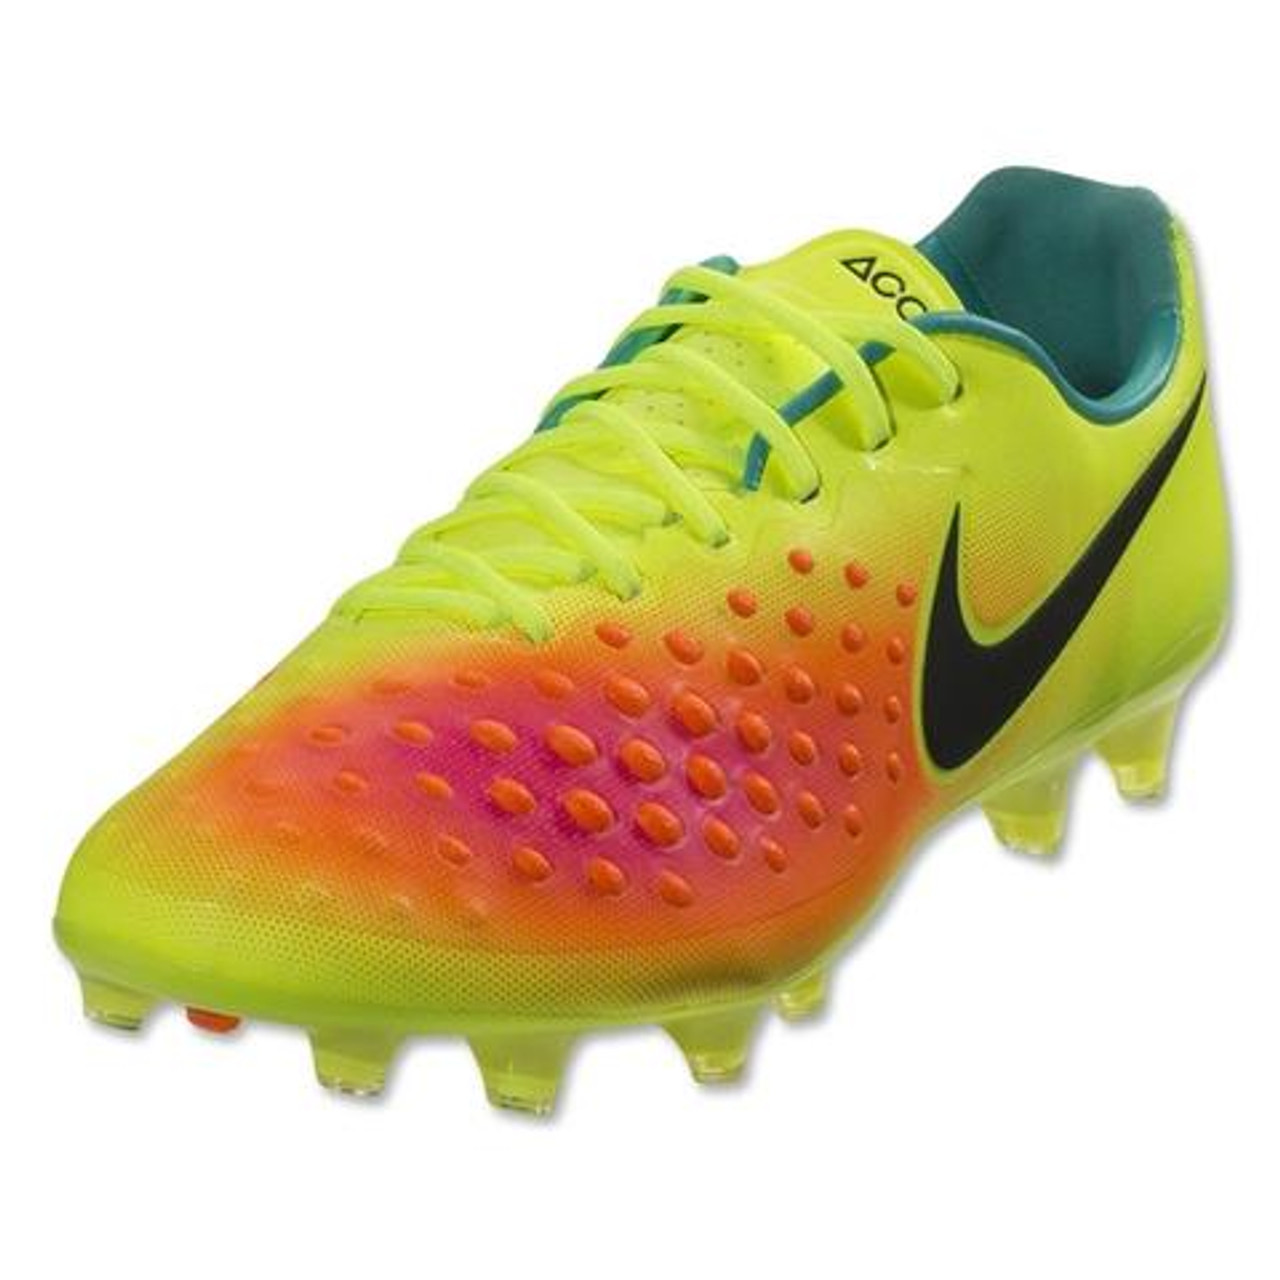 ab03680b87 Nike Magista Opus II FG - Volt Total Orange Pink Blast Black (100518) - ohp  soccer